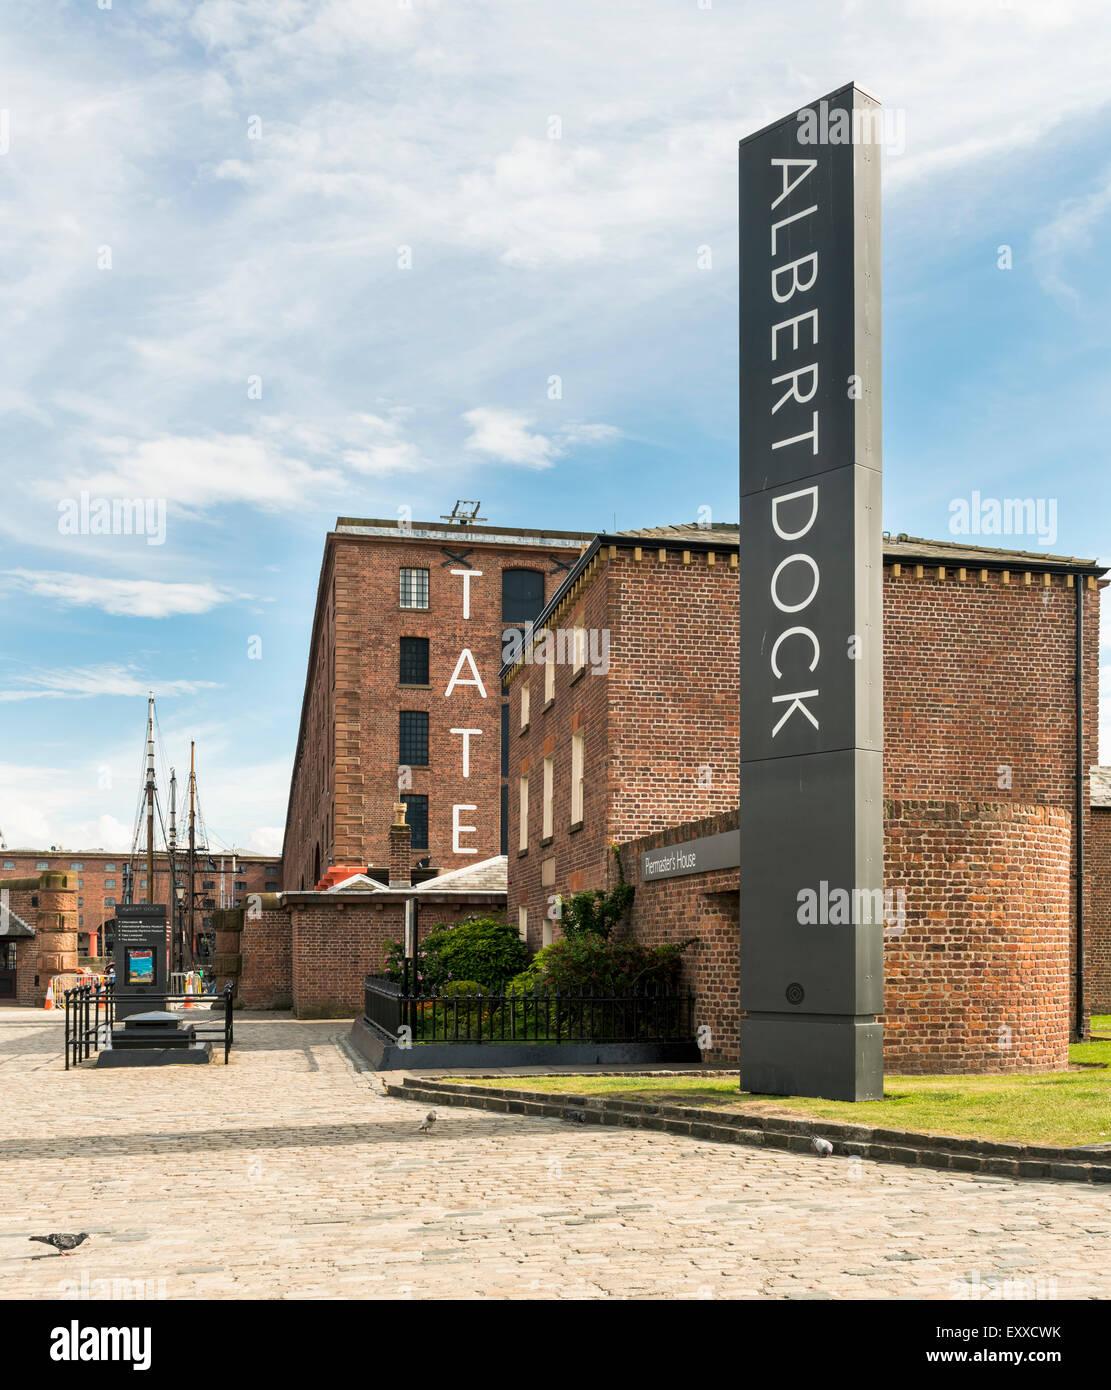 Albert Dock y Tate Liverpool, Reino Unido Foto de stock